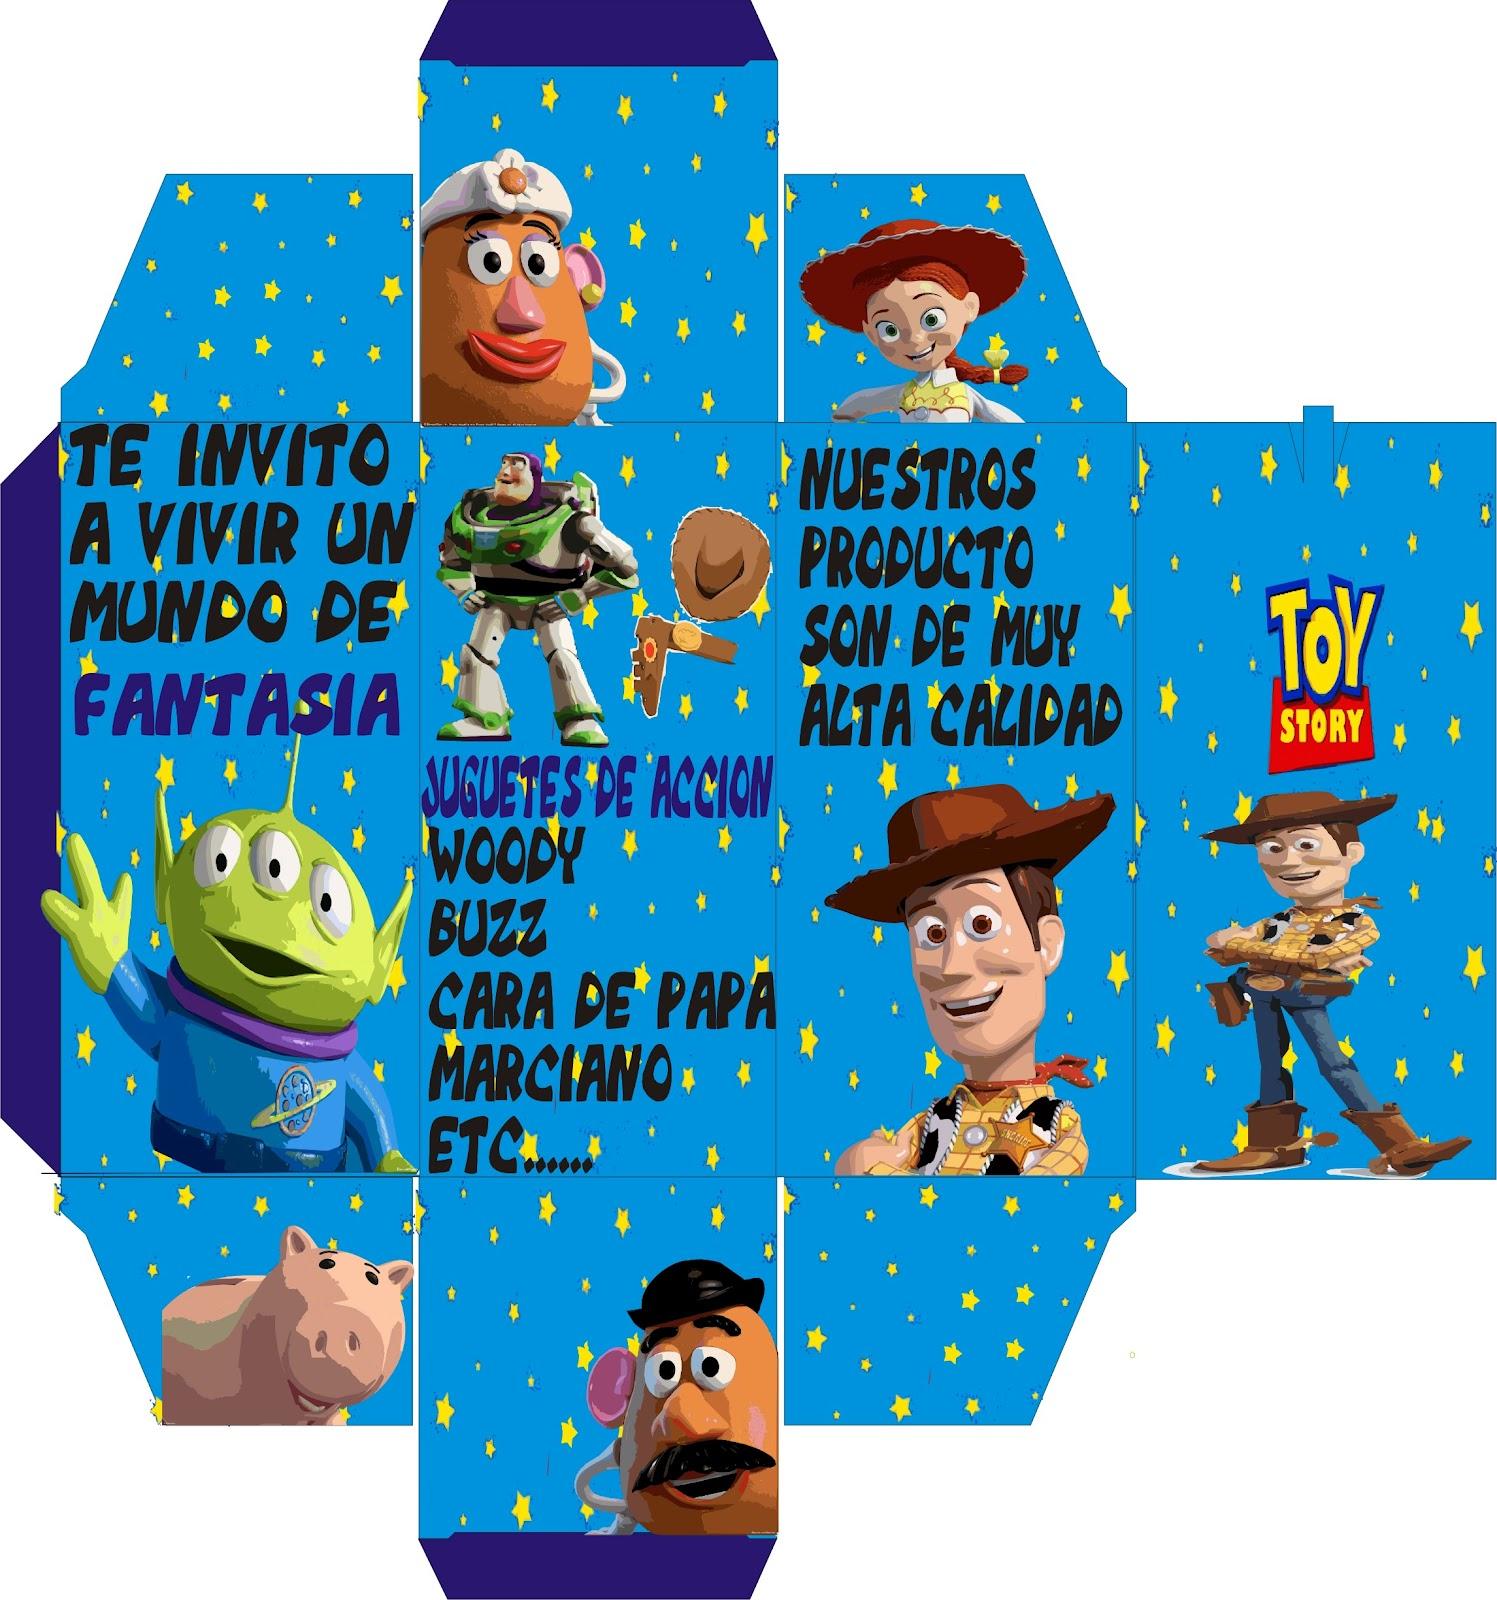 Toy Story 4 2012 : Evidencias diseño grafico empaque toy story